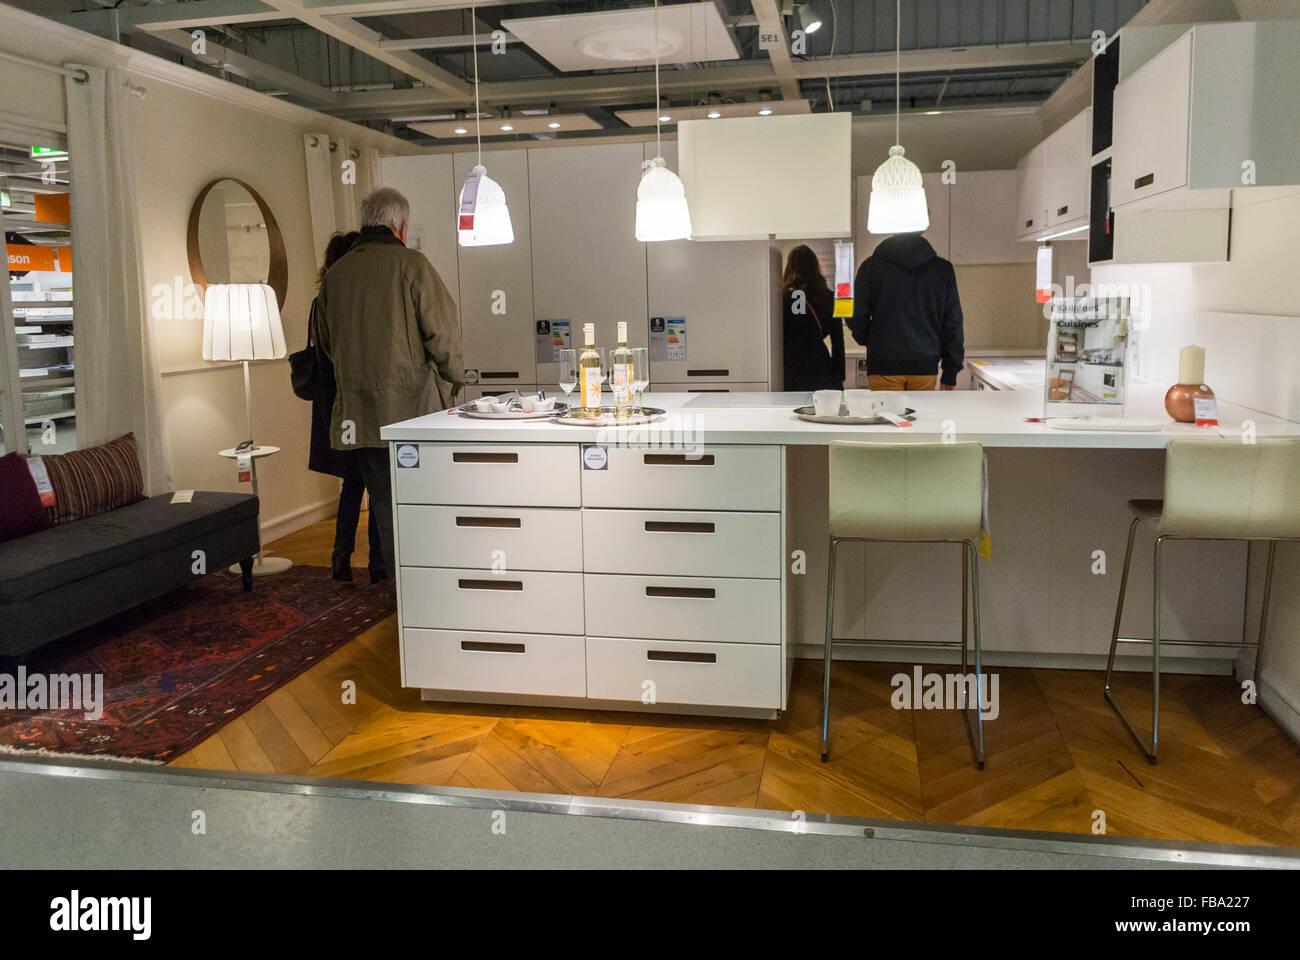 Mobili Ikea Cucina : Parigi francia people shopping in diy housewares store ikea